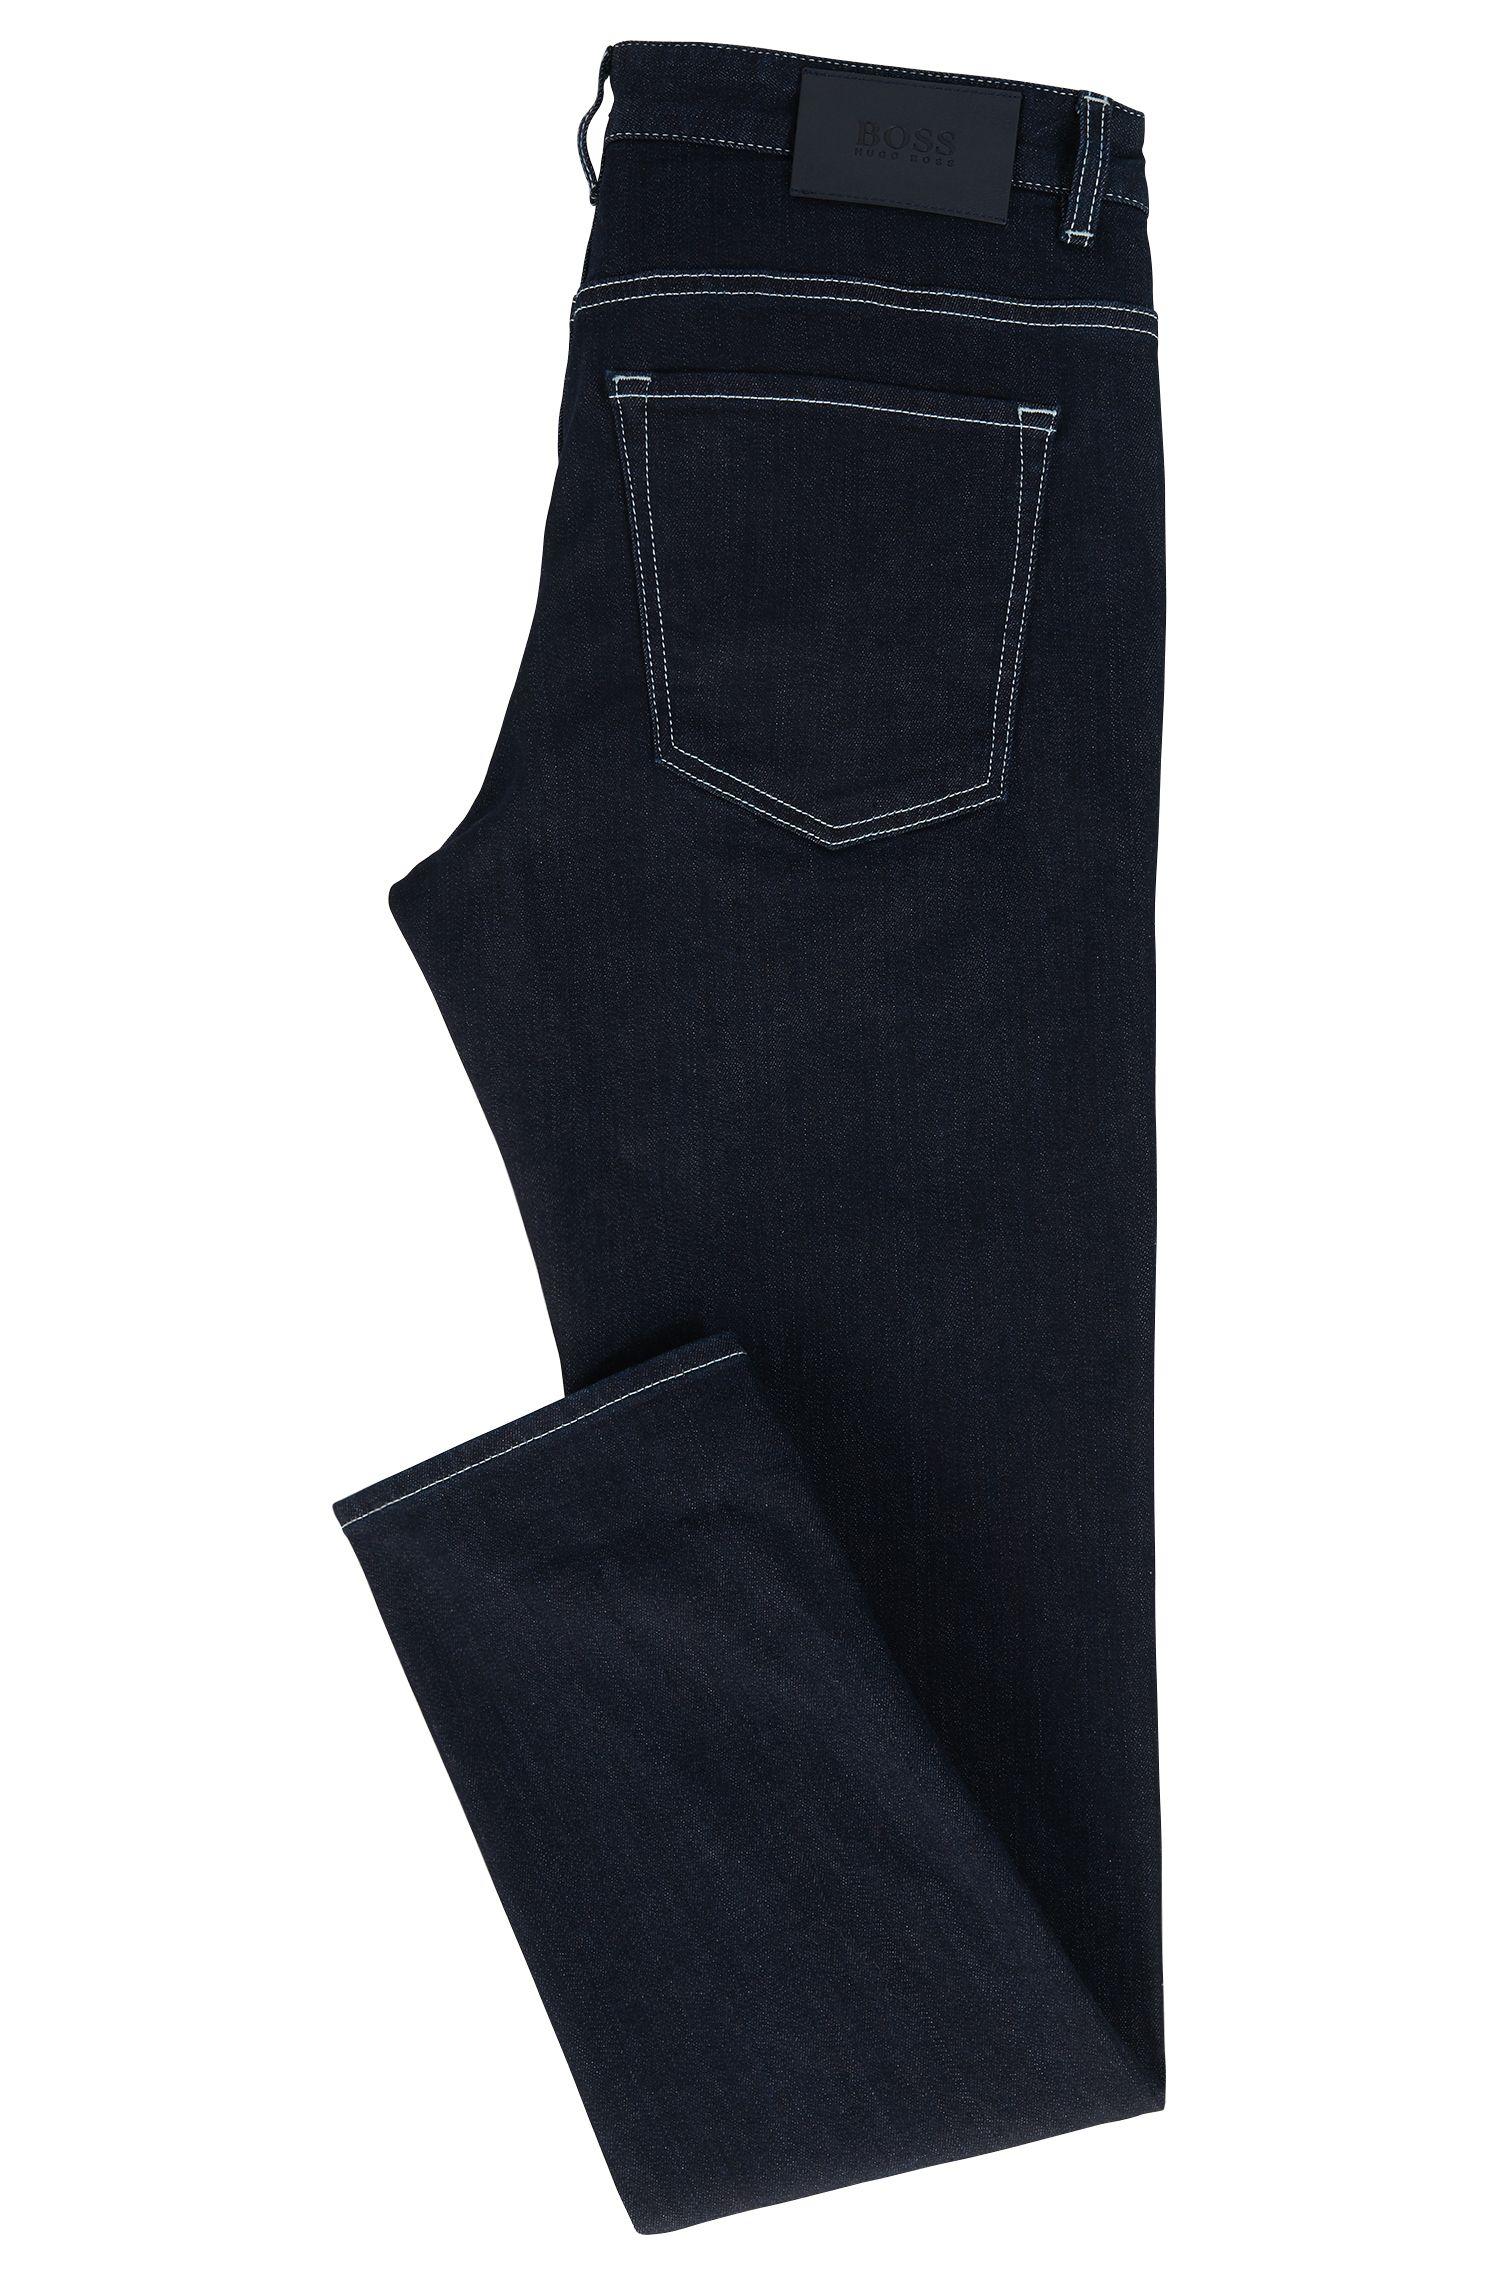 10.6 oz Stretch Cotton Jean, Slim Fit | Delaware, Dark Blue